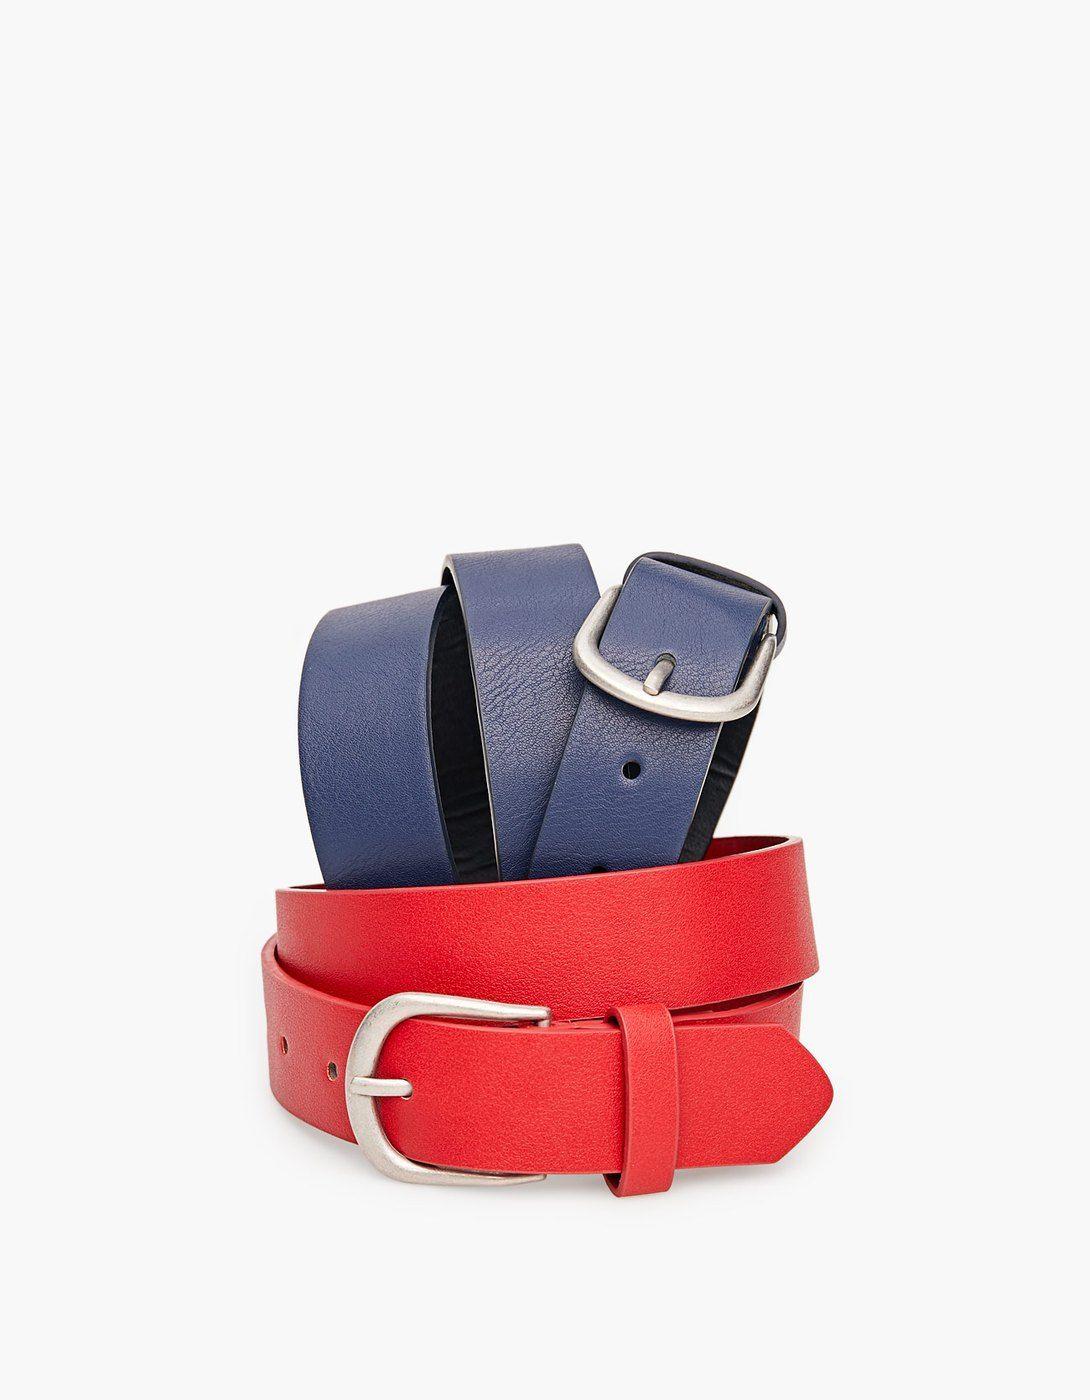 Basic Belt Belts Stradivarius Republic Of Ireland Belt Stradivarius Republic Of Ireland